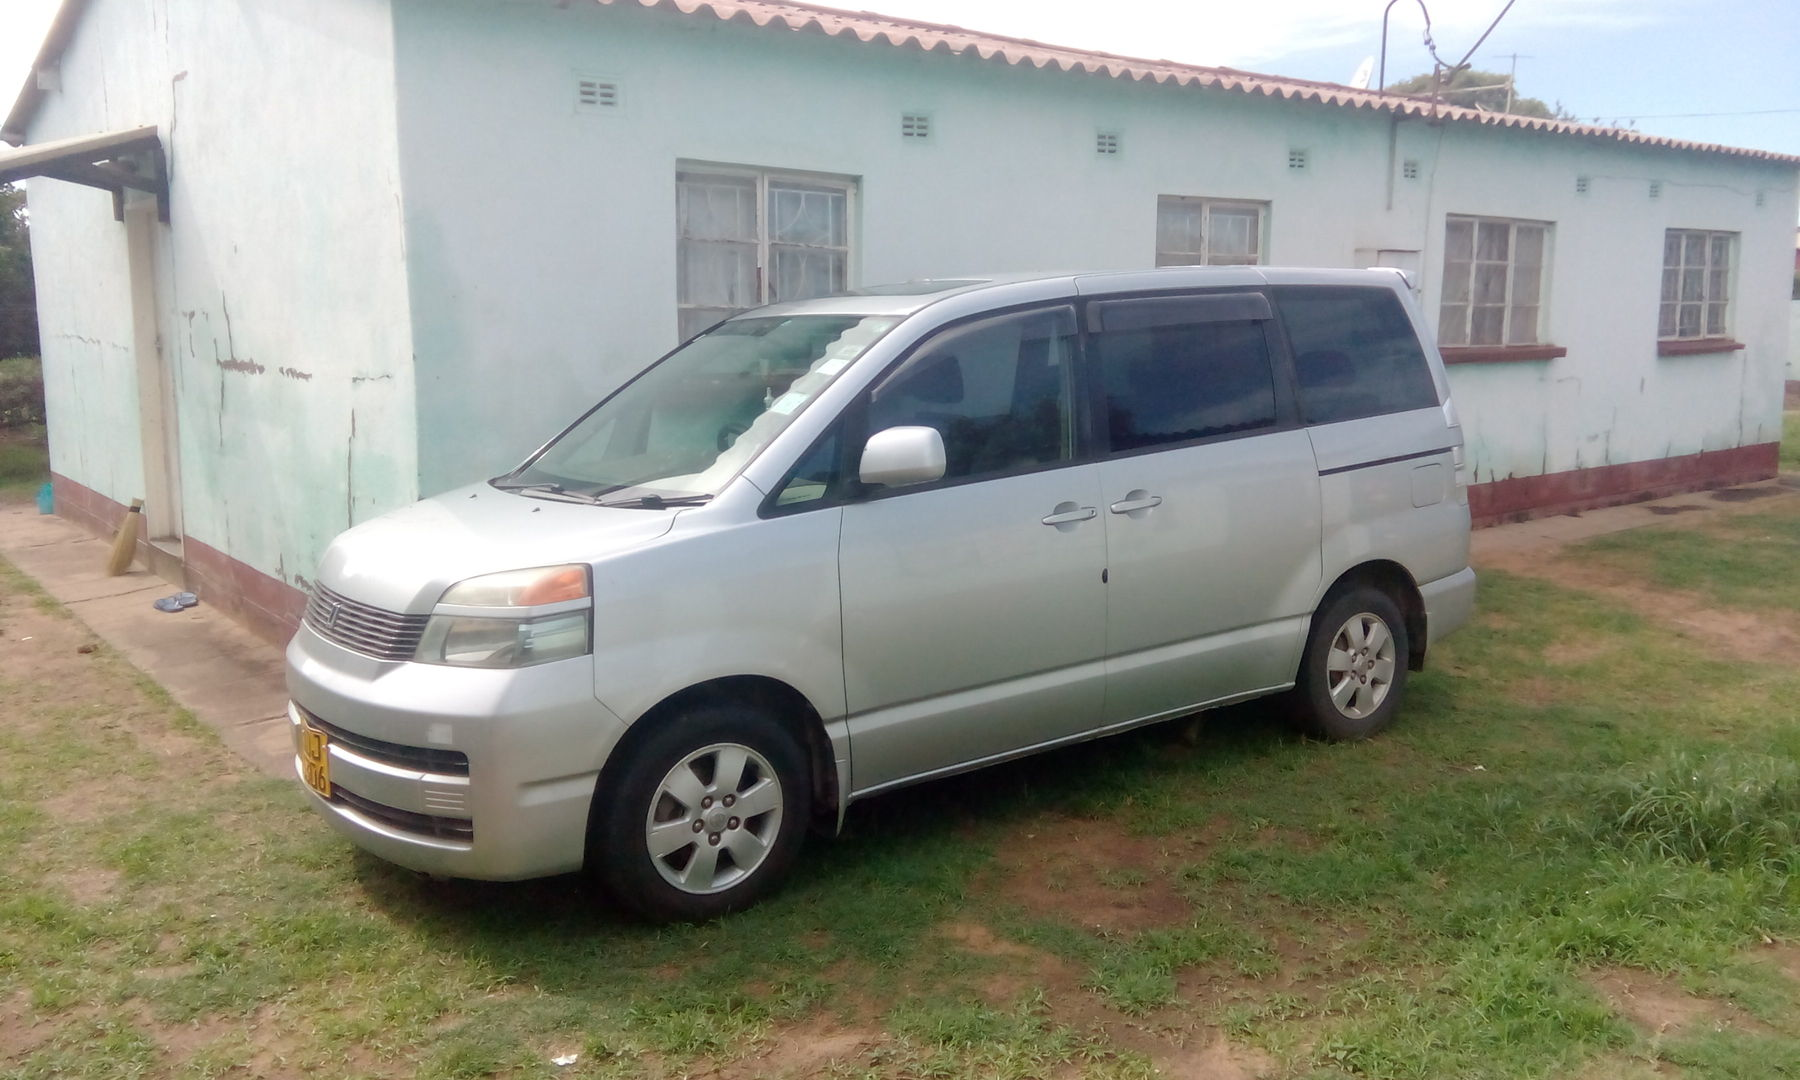 Best Price Used TOYOTA CORONA PREMIO for Sale - Japanese Used Cars